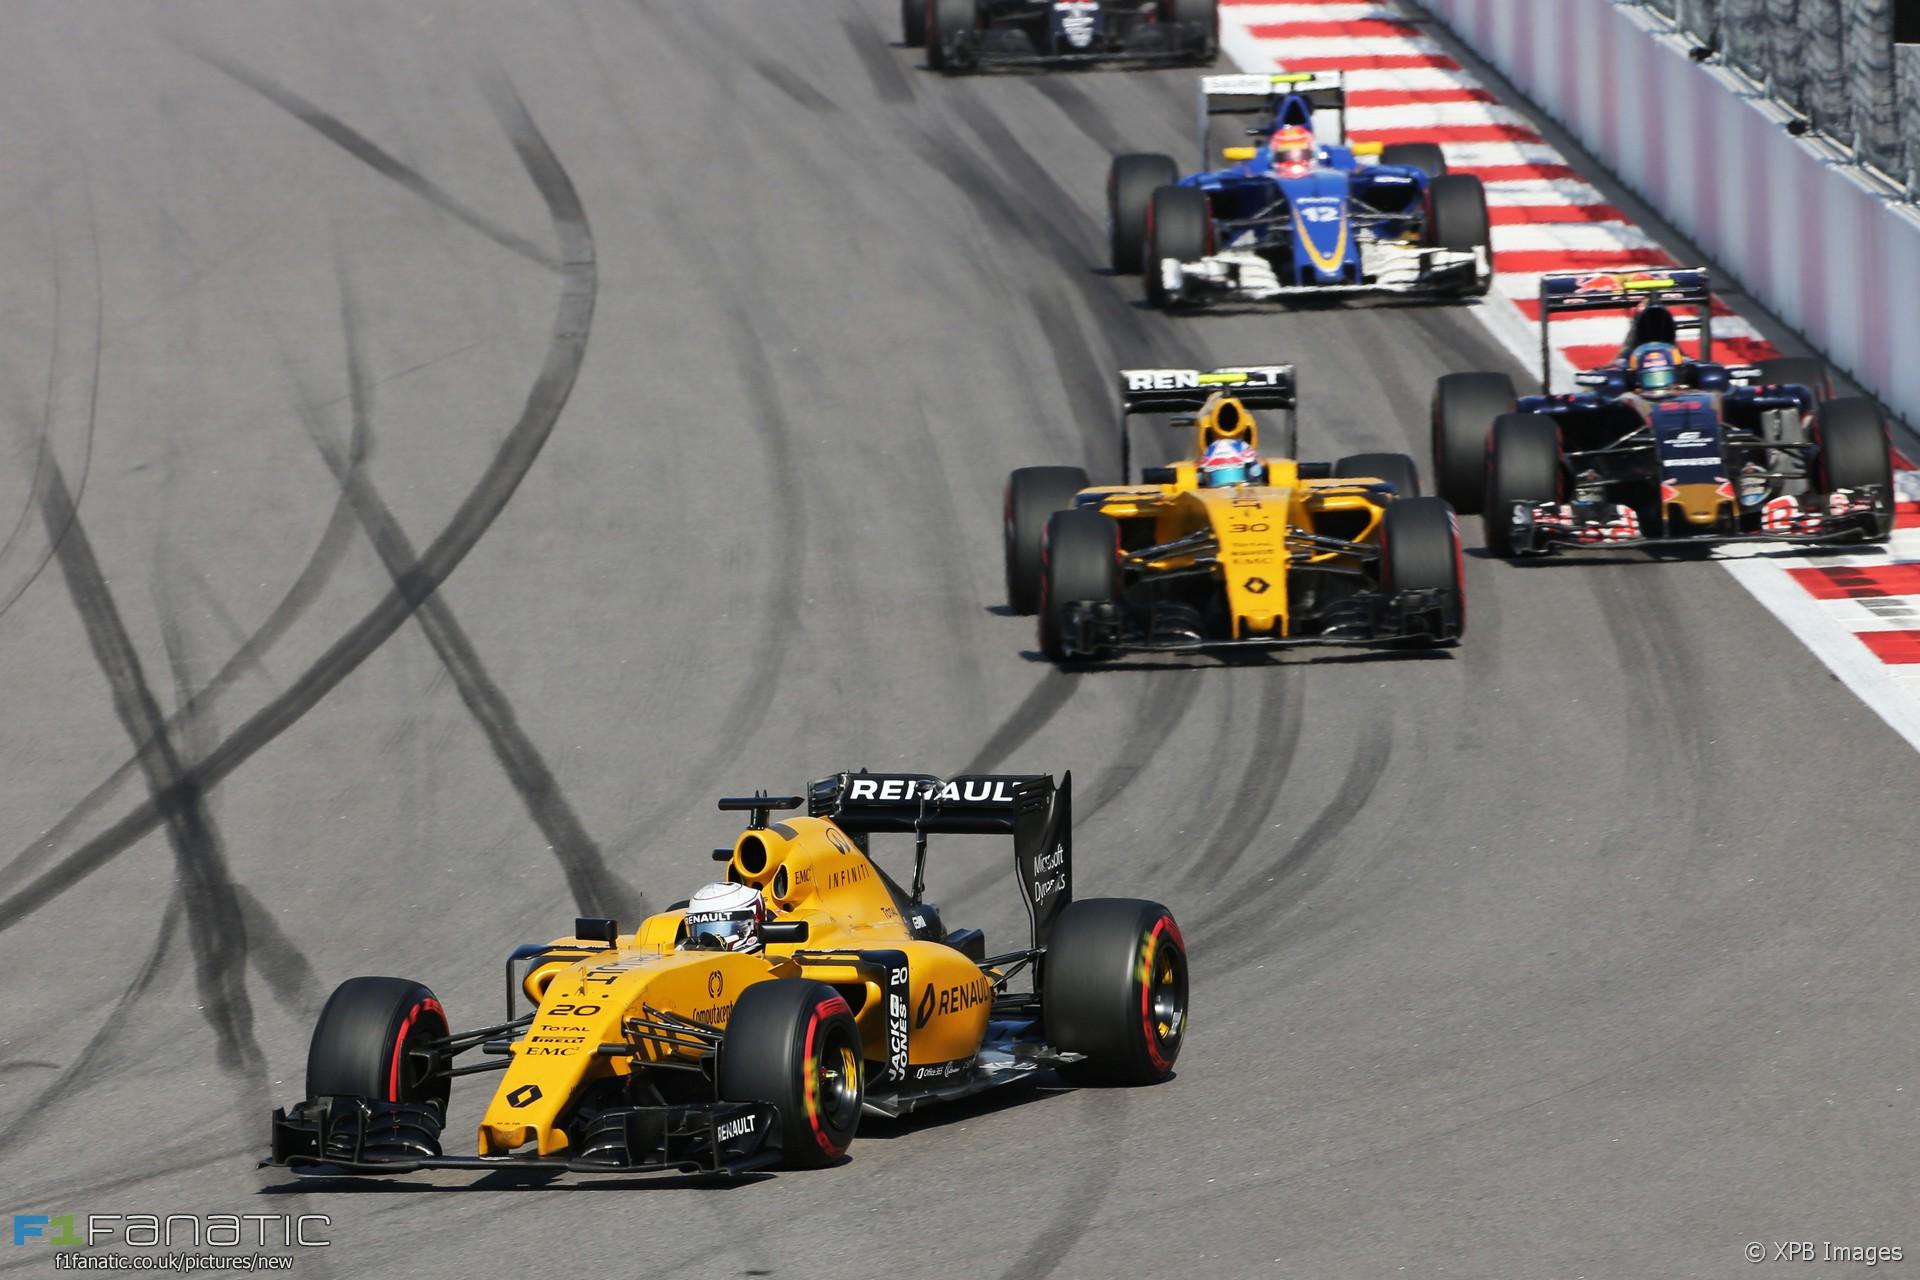 Kevin Magnussen, Renault, Sochi Autodrom, 2016